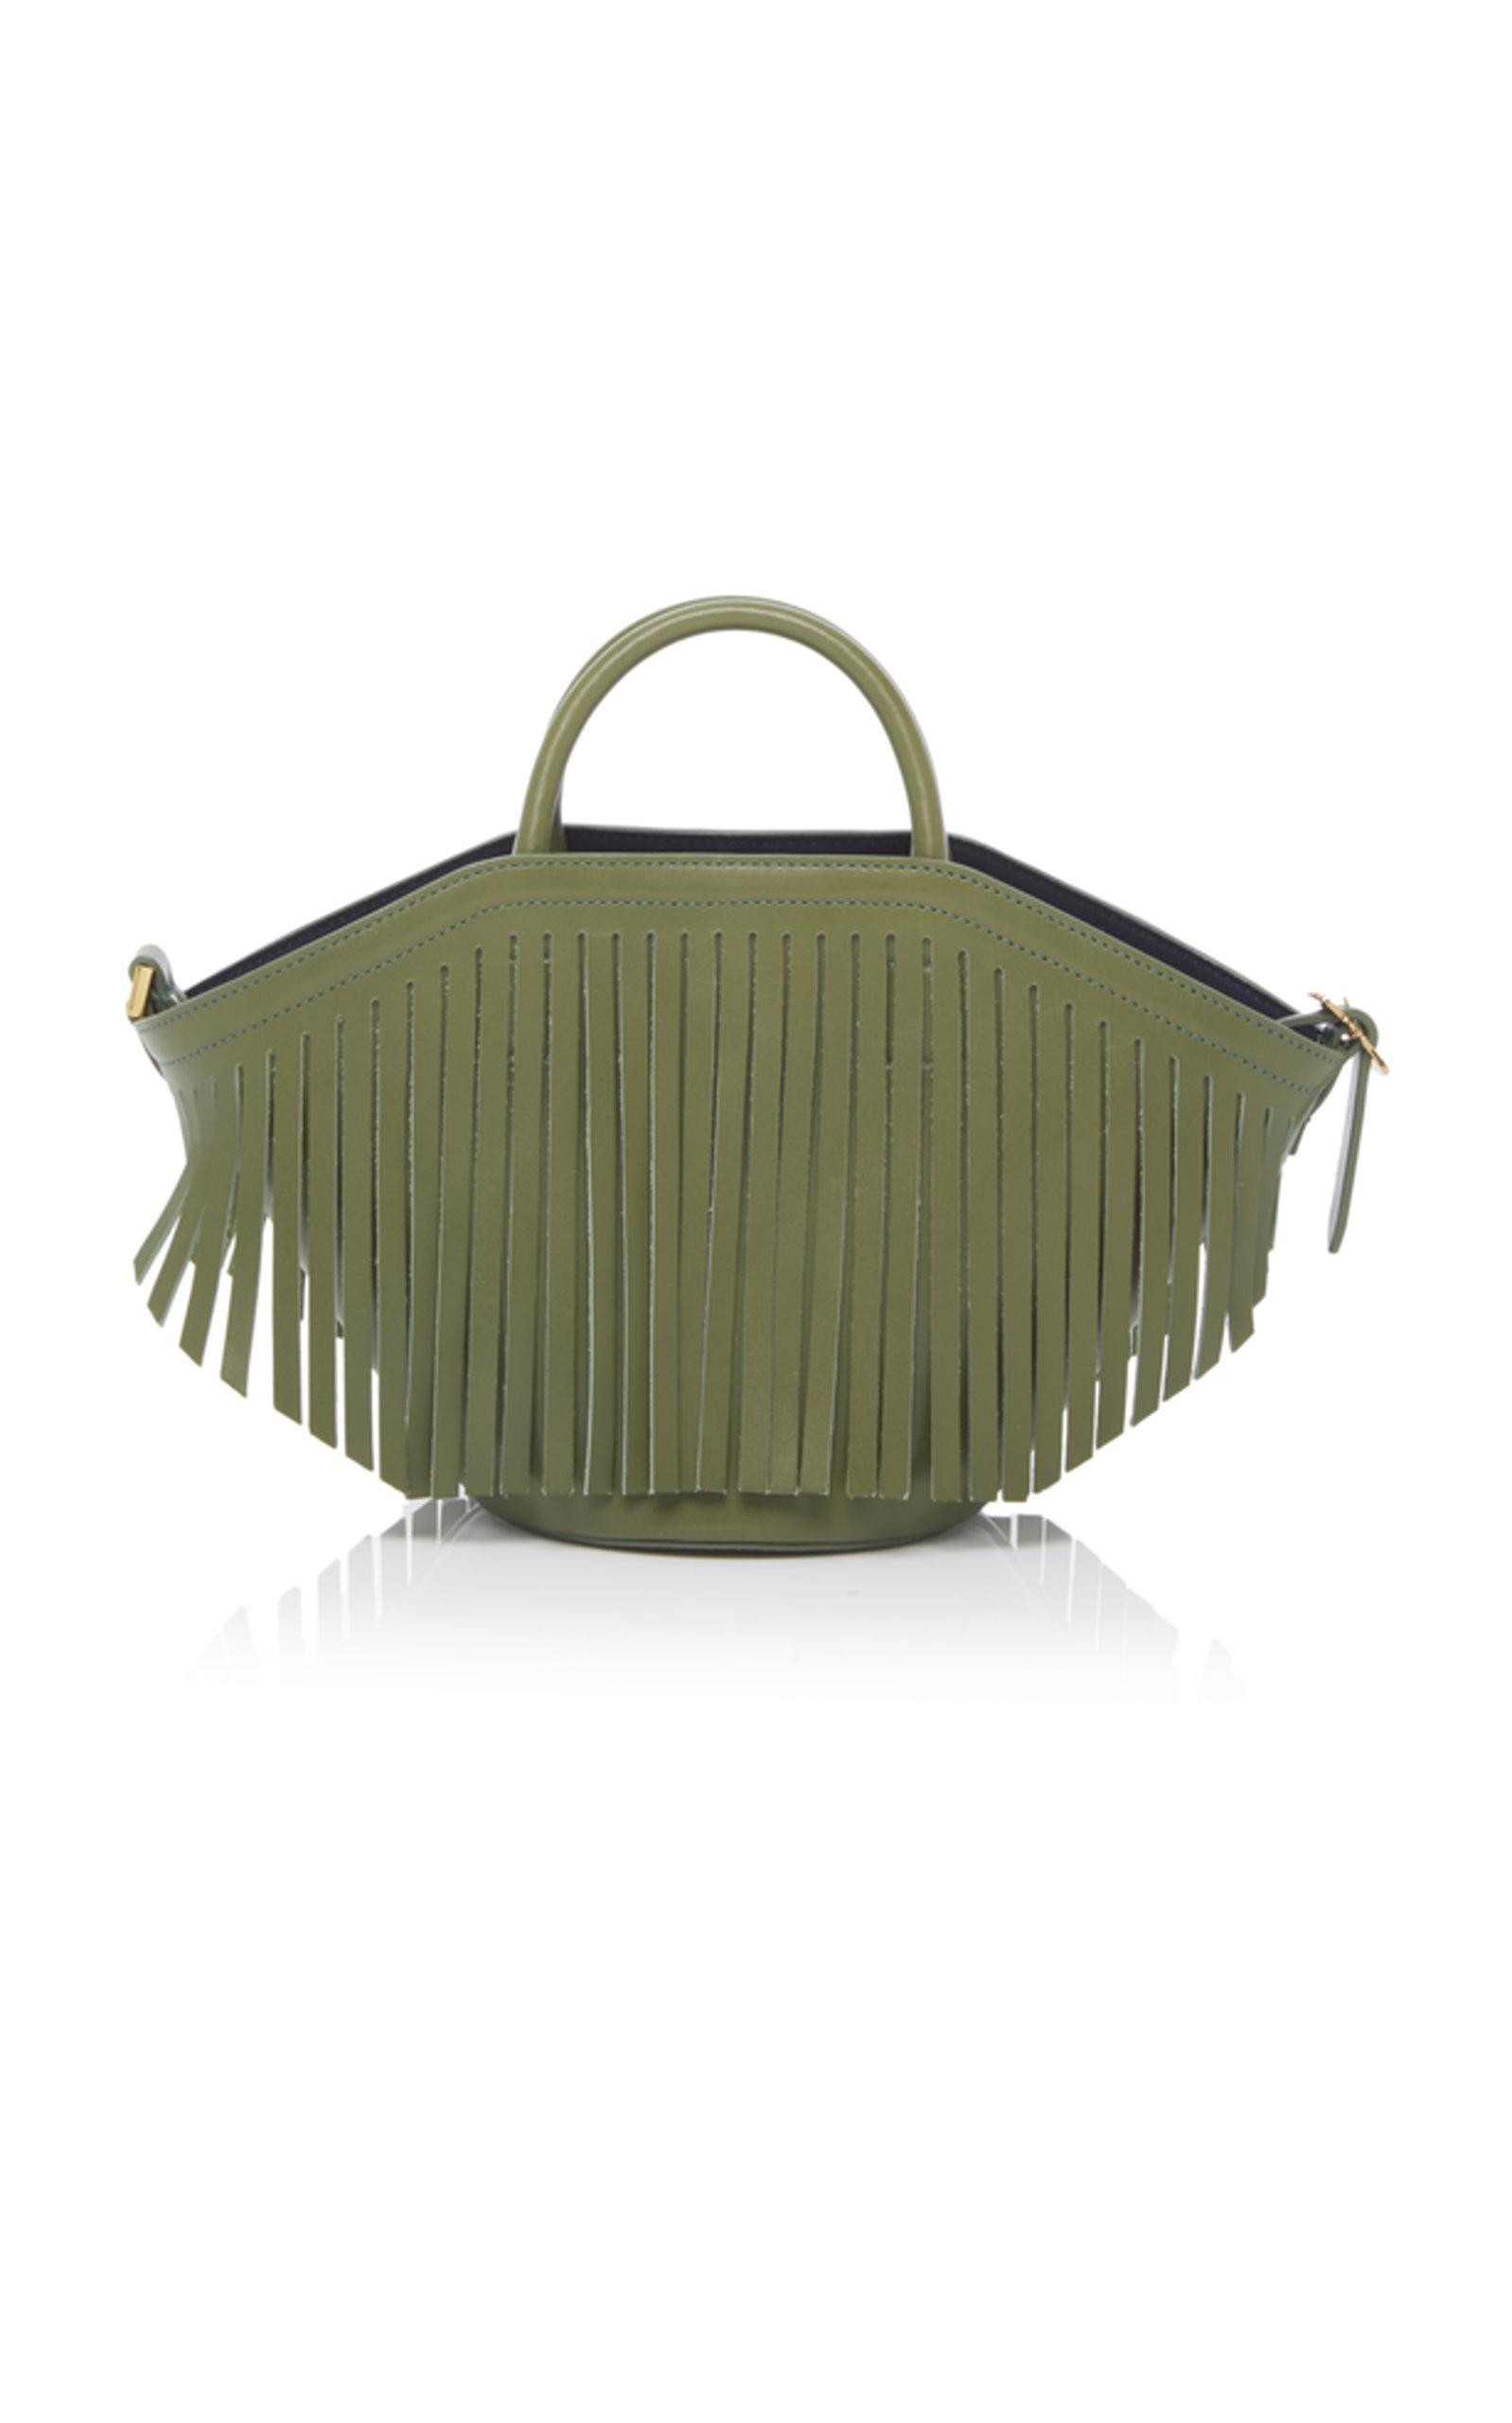 Trademark Small Fringe Basket eYY2gZm8